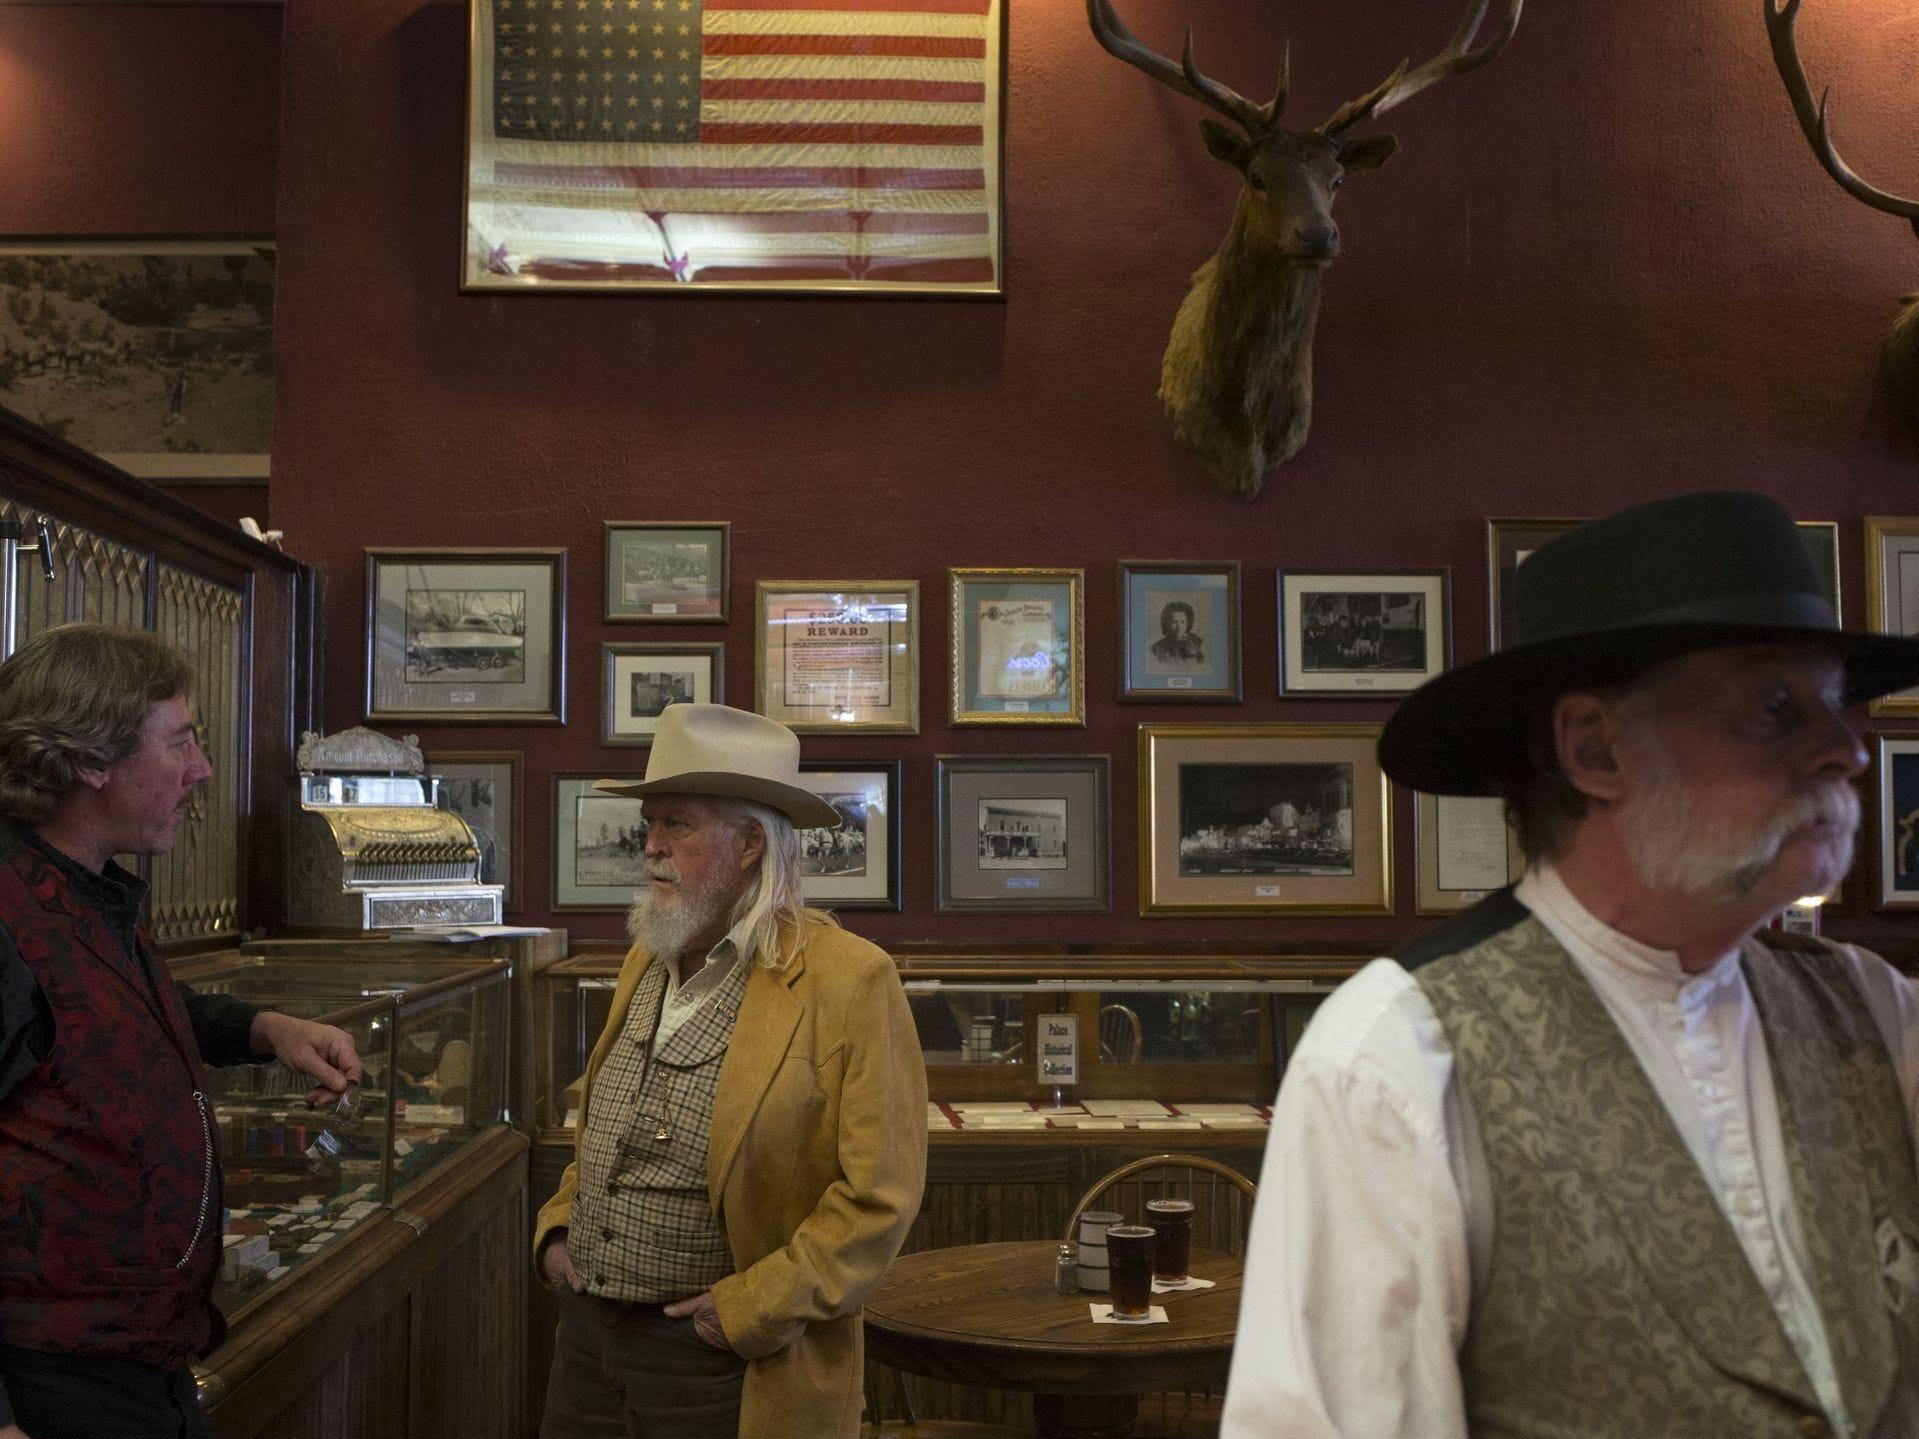 Scott Stanford (izq), gerente general, habla con Bob Anderson (centro), el 6 de noviembre de 2017, en el Palace Saloon and Restaurant 120 S. Montezuma Street, Prescott, Arizona.